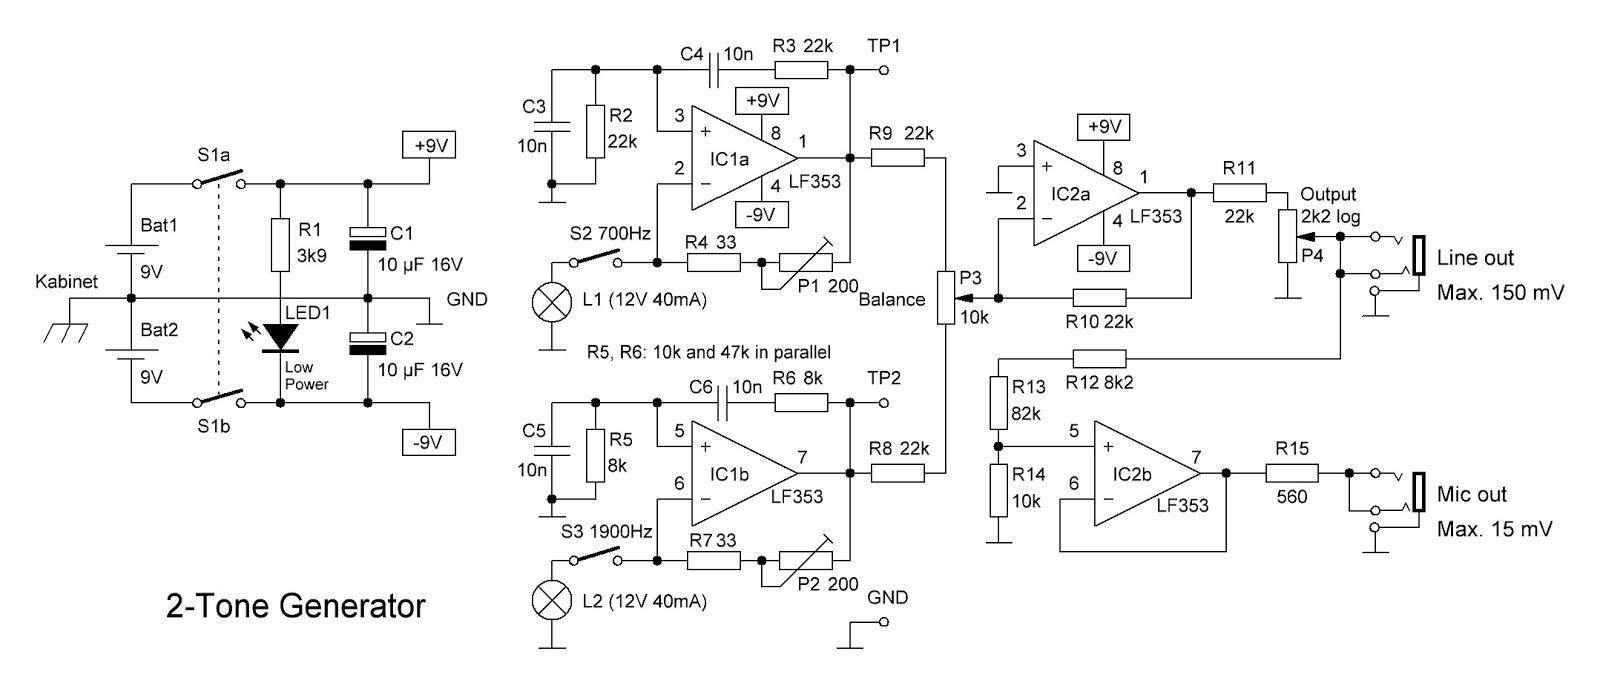 two tone generator circuit diagram  [ 1600 x 683 Pixel ]